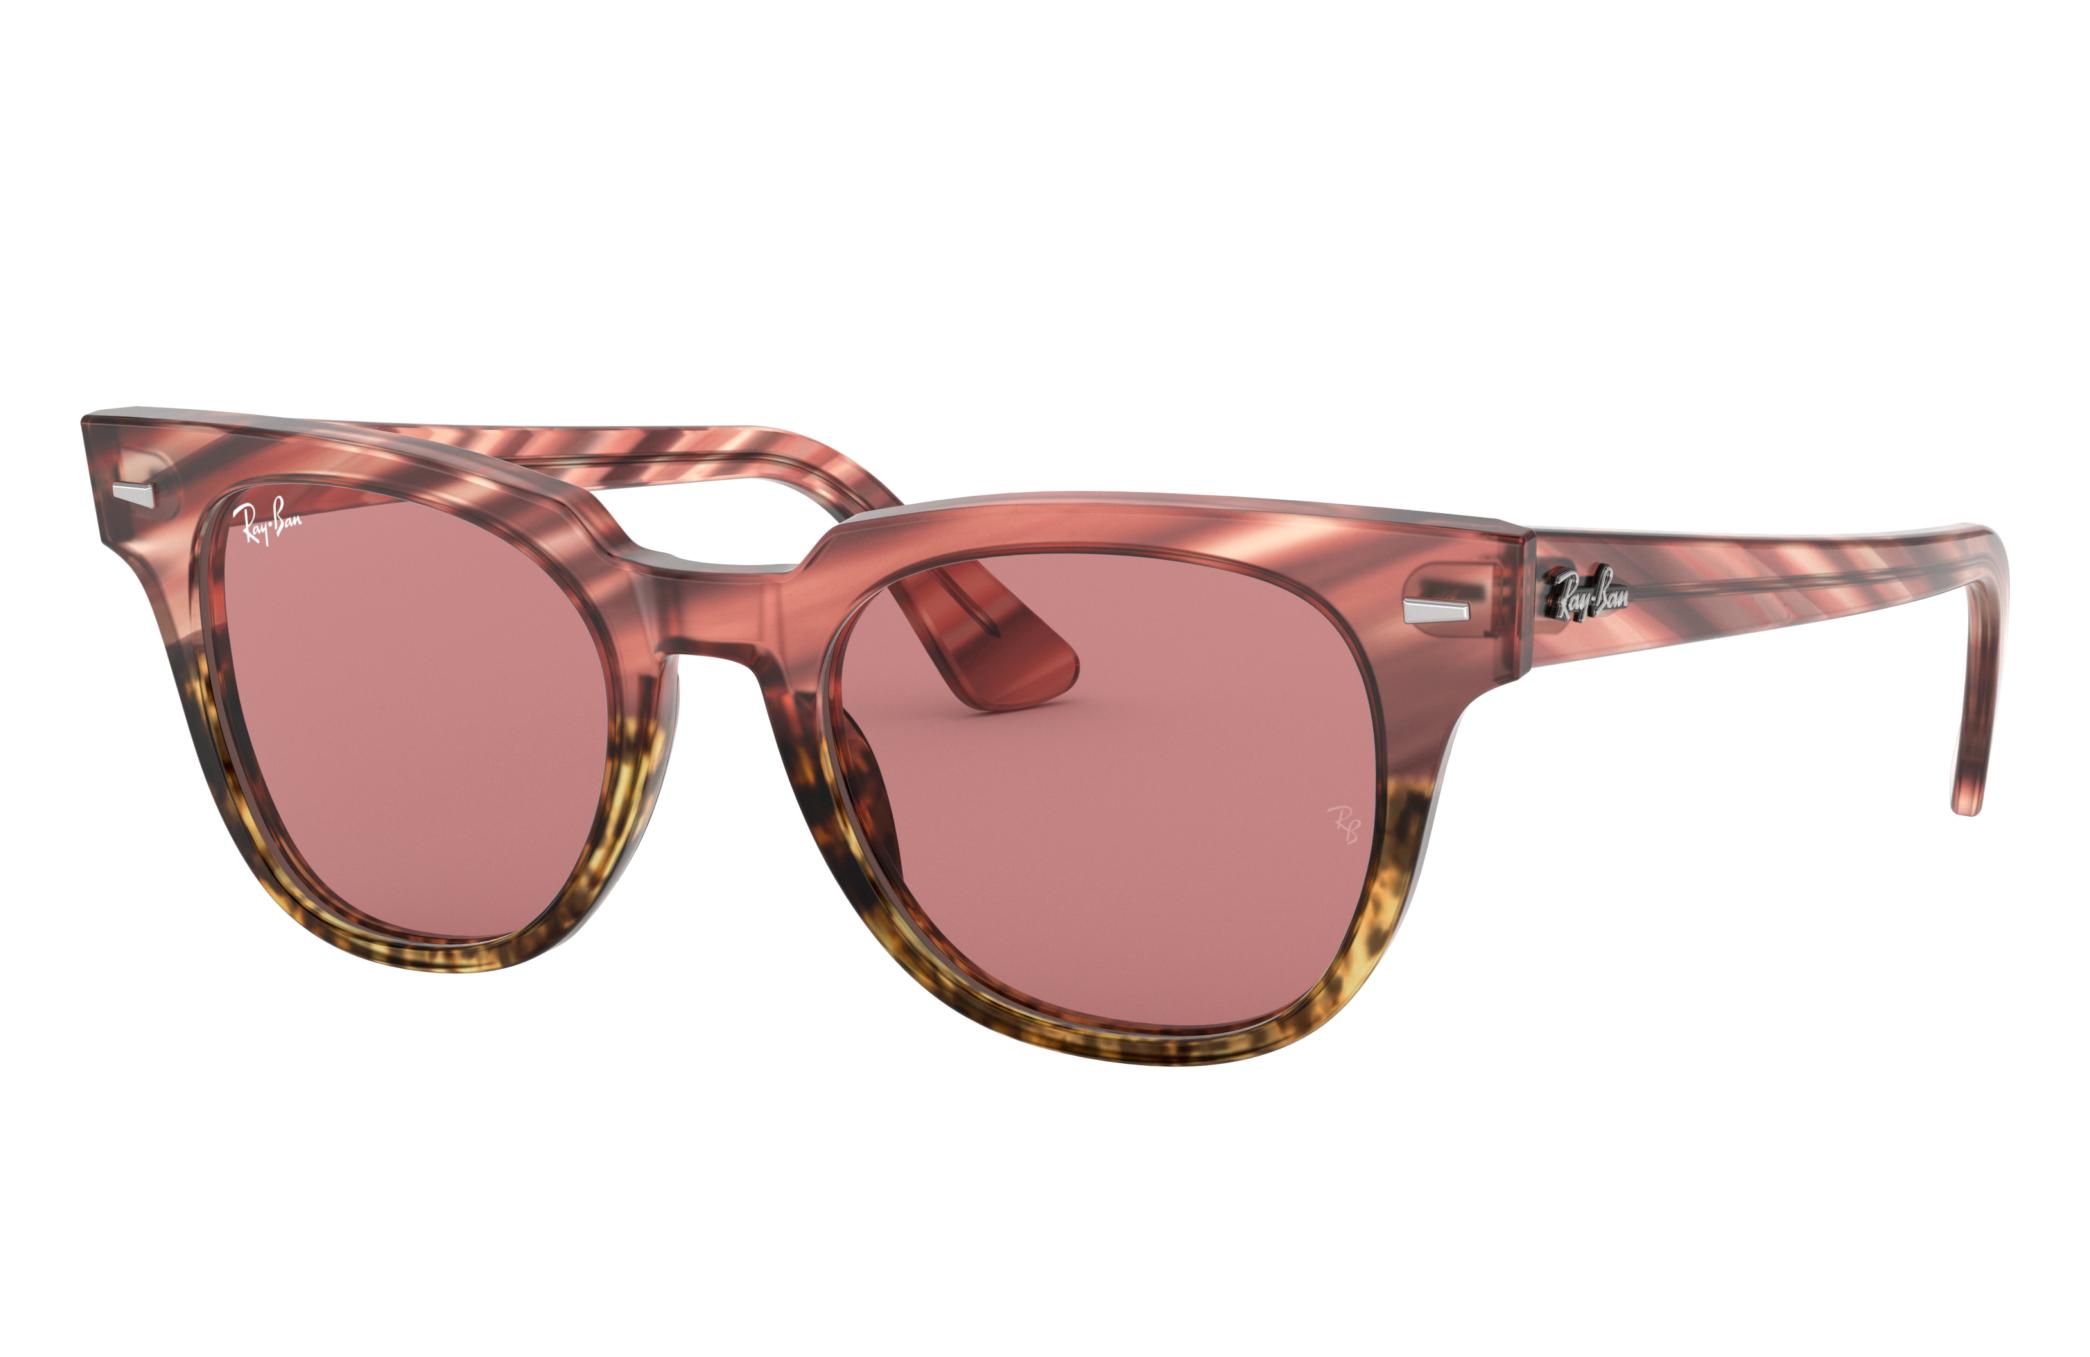 Ray-Ban Meteor Striped Havana Pink, Violet Lenses - RB2168